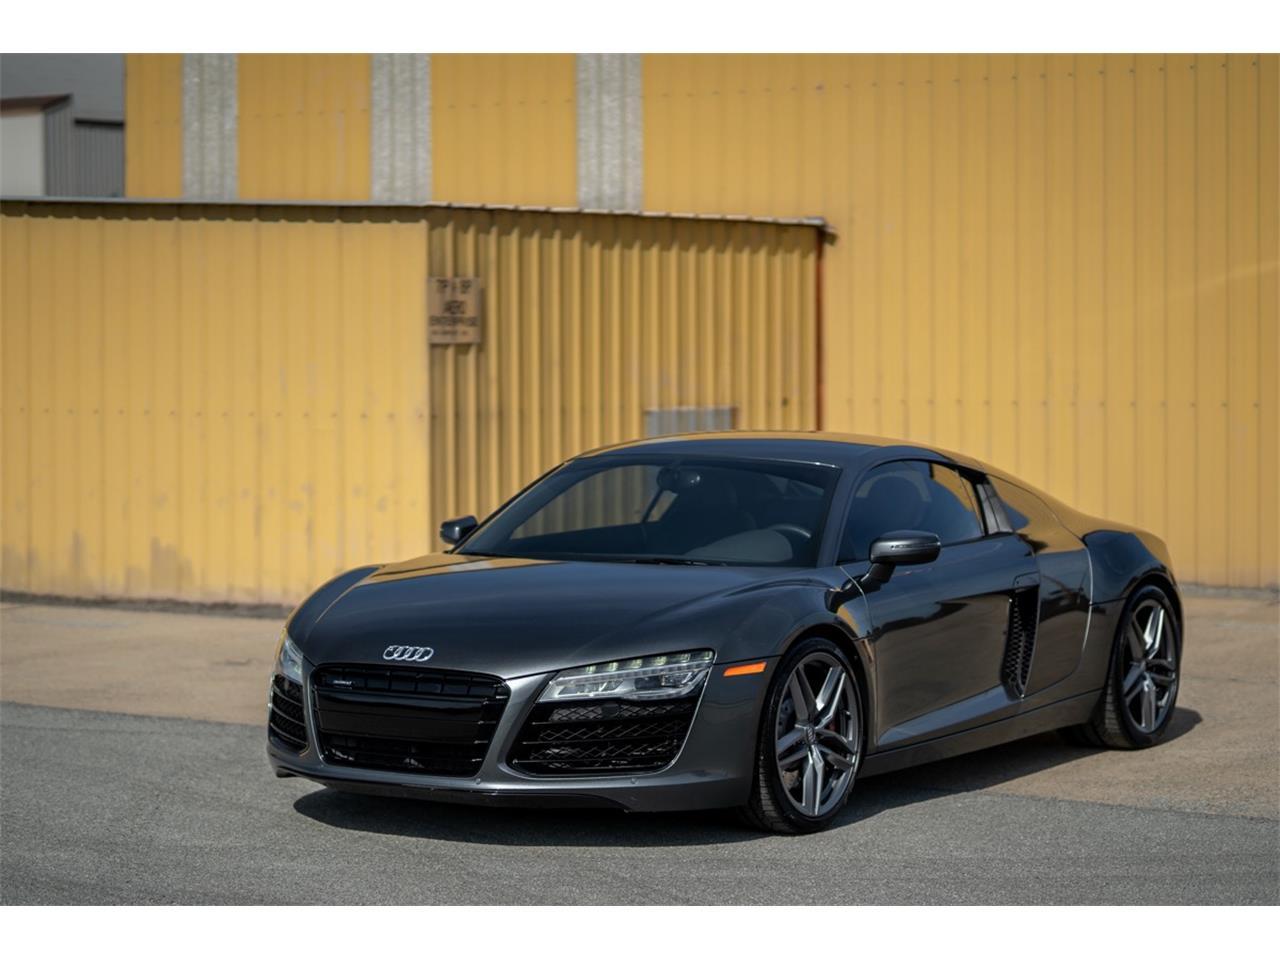 2015 Audi R8 (CC-1336709) for sale in Monterey, California